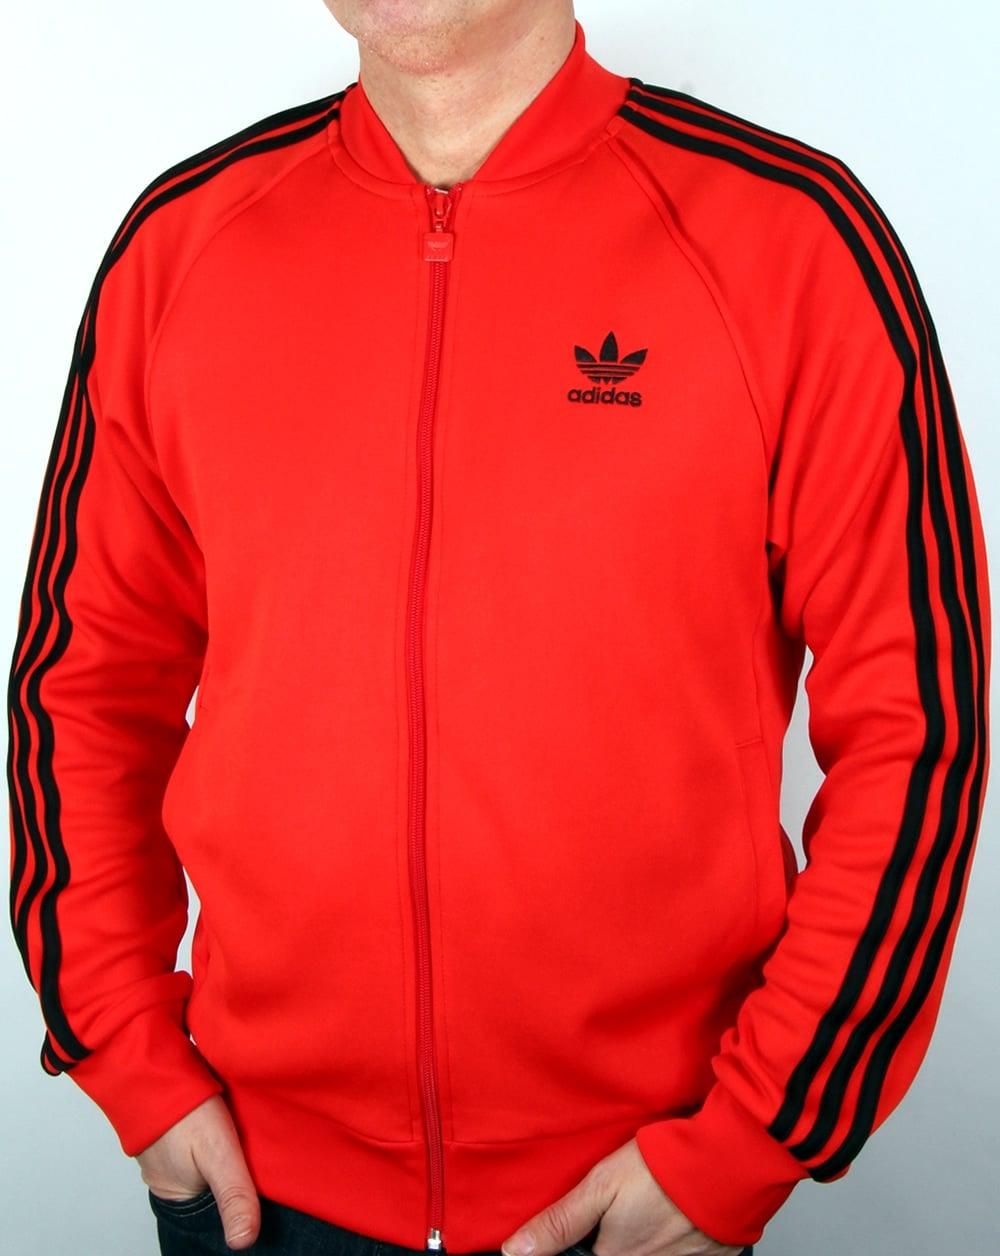 adidas Originals Adidas Originals Superstar Track Top Core Red 78fbb89cf